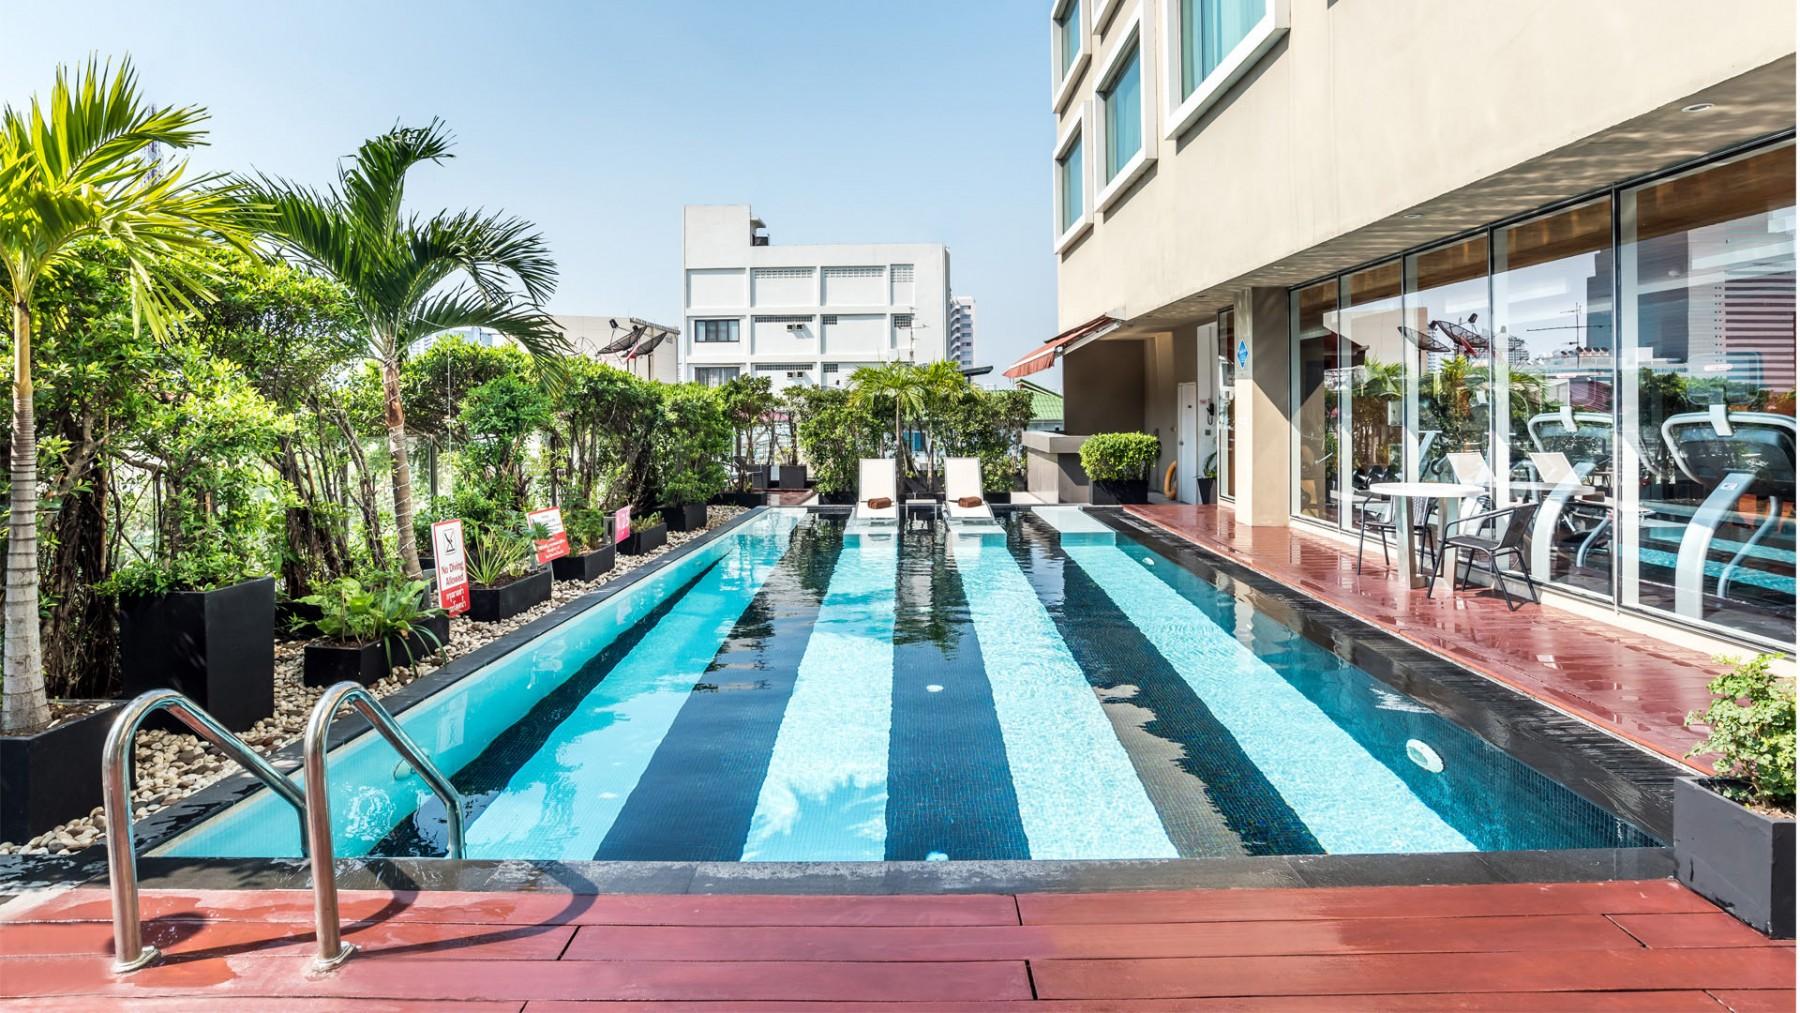 Bangkok Hotel Swimming Pool Novotel Bangkok Silom